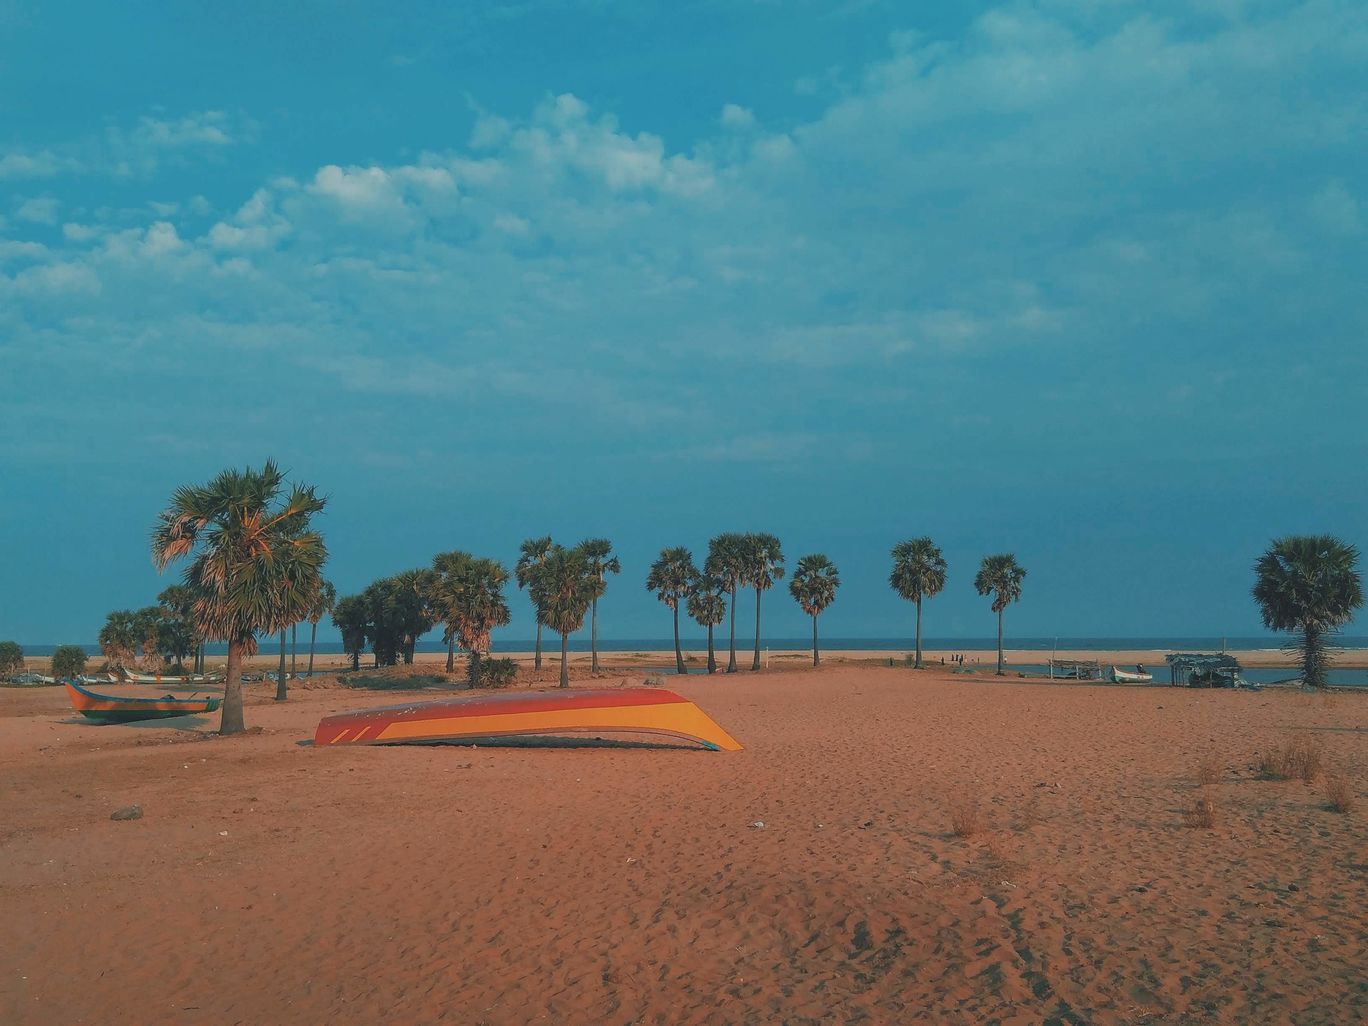 Photo of Puducherry By Monalisa dungdung